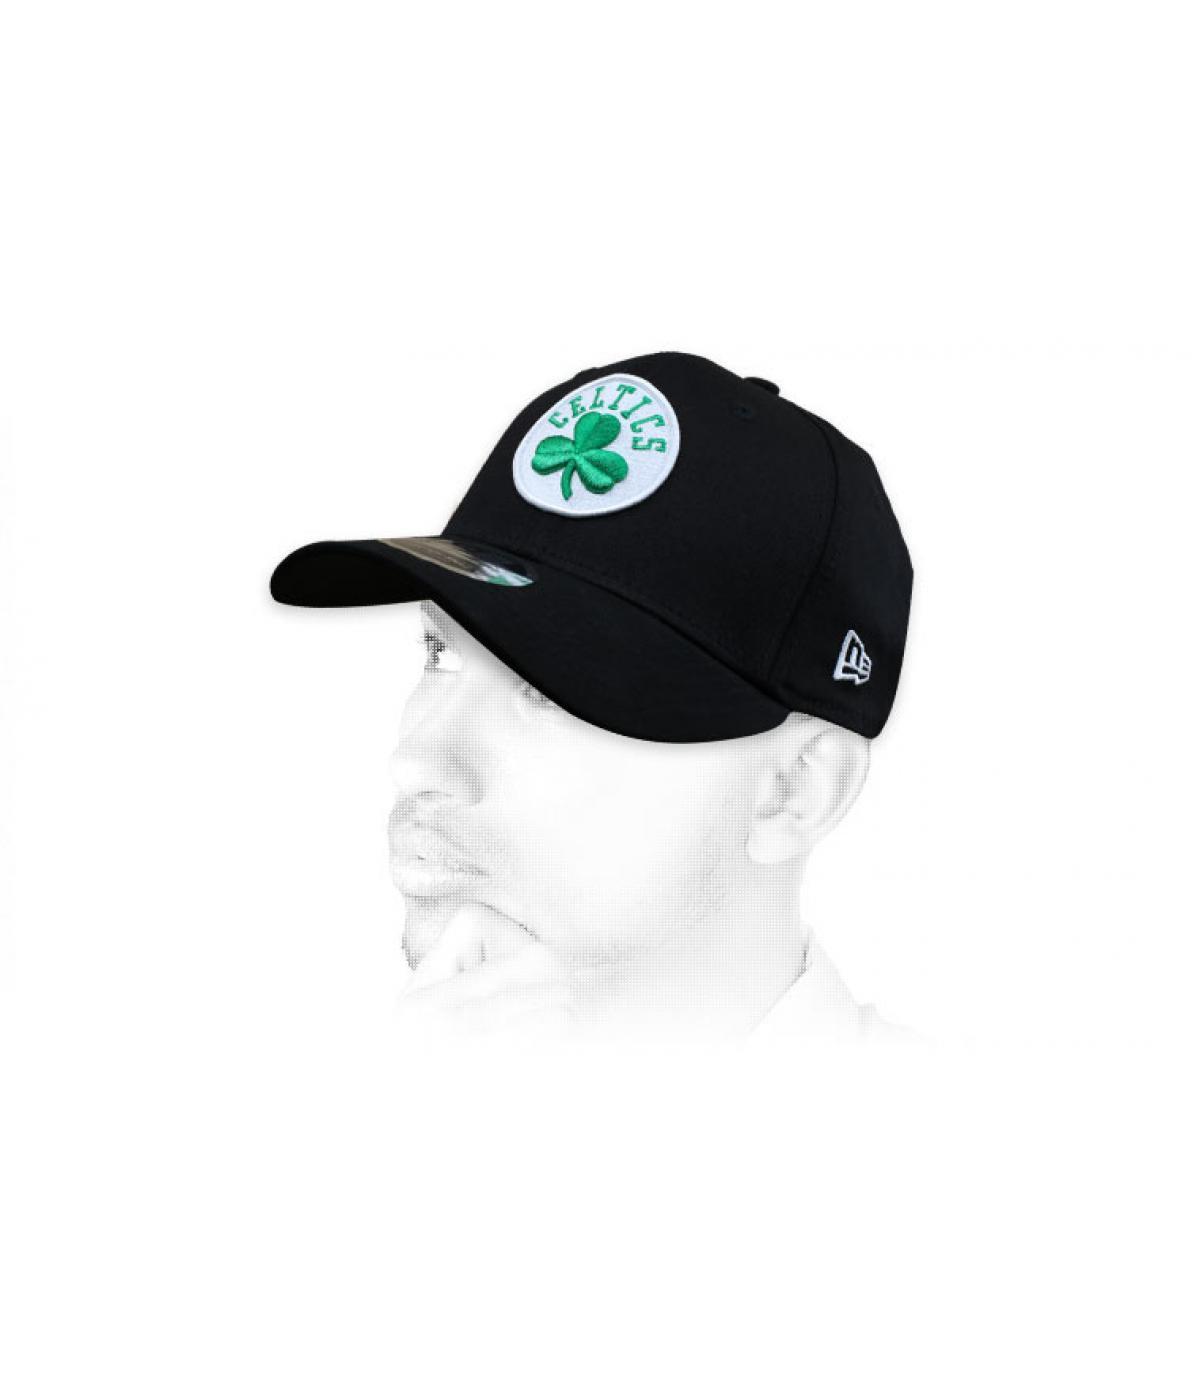 zwarte Celtics cap